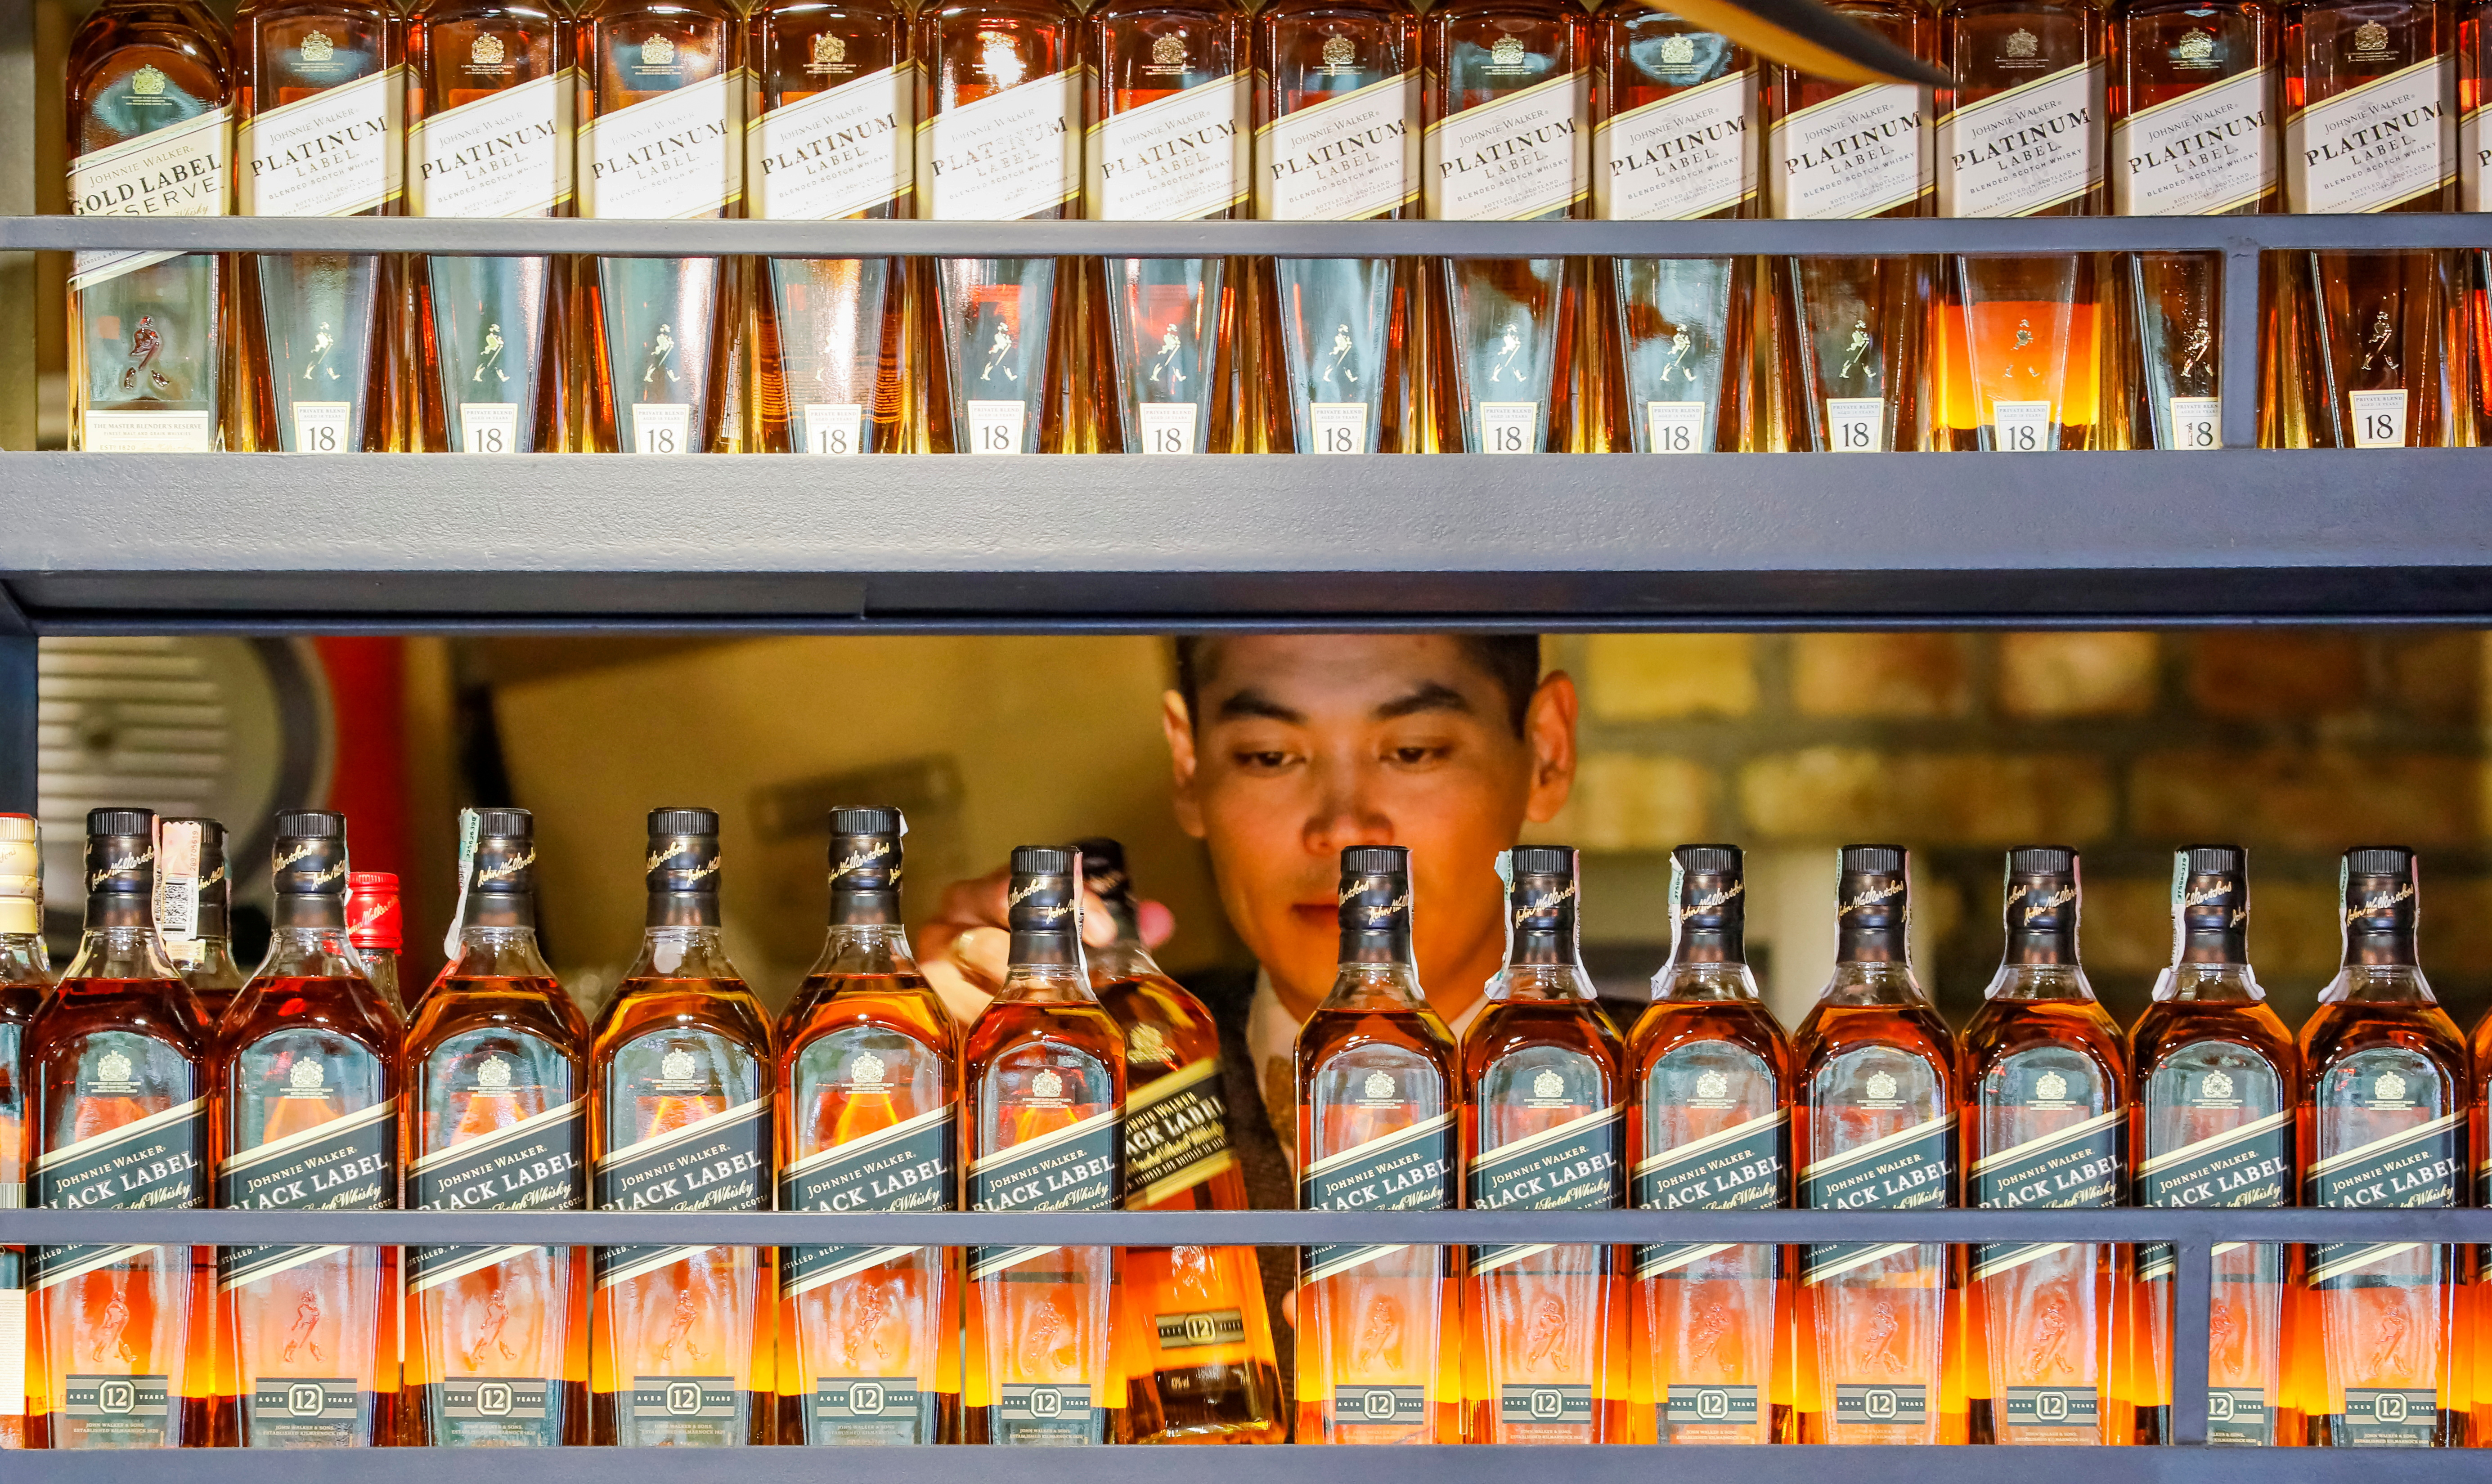 A bartender takes a bottle of Johnnie Walker whisky in Almaty, Kazakhstan June 22, 2017.  REUTERS/Shamil Zhumatov/File Photo